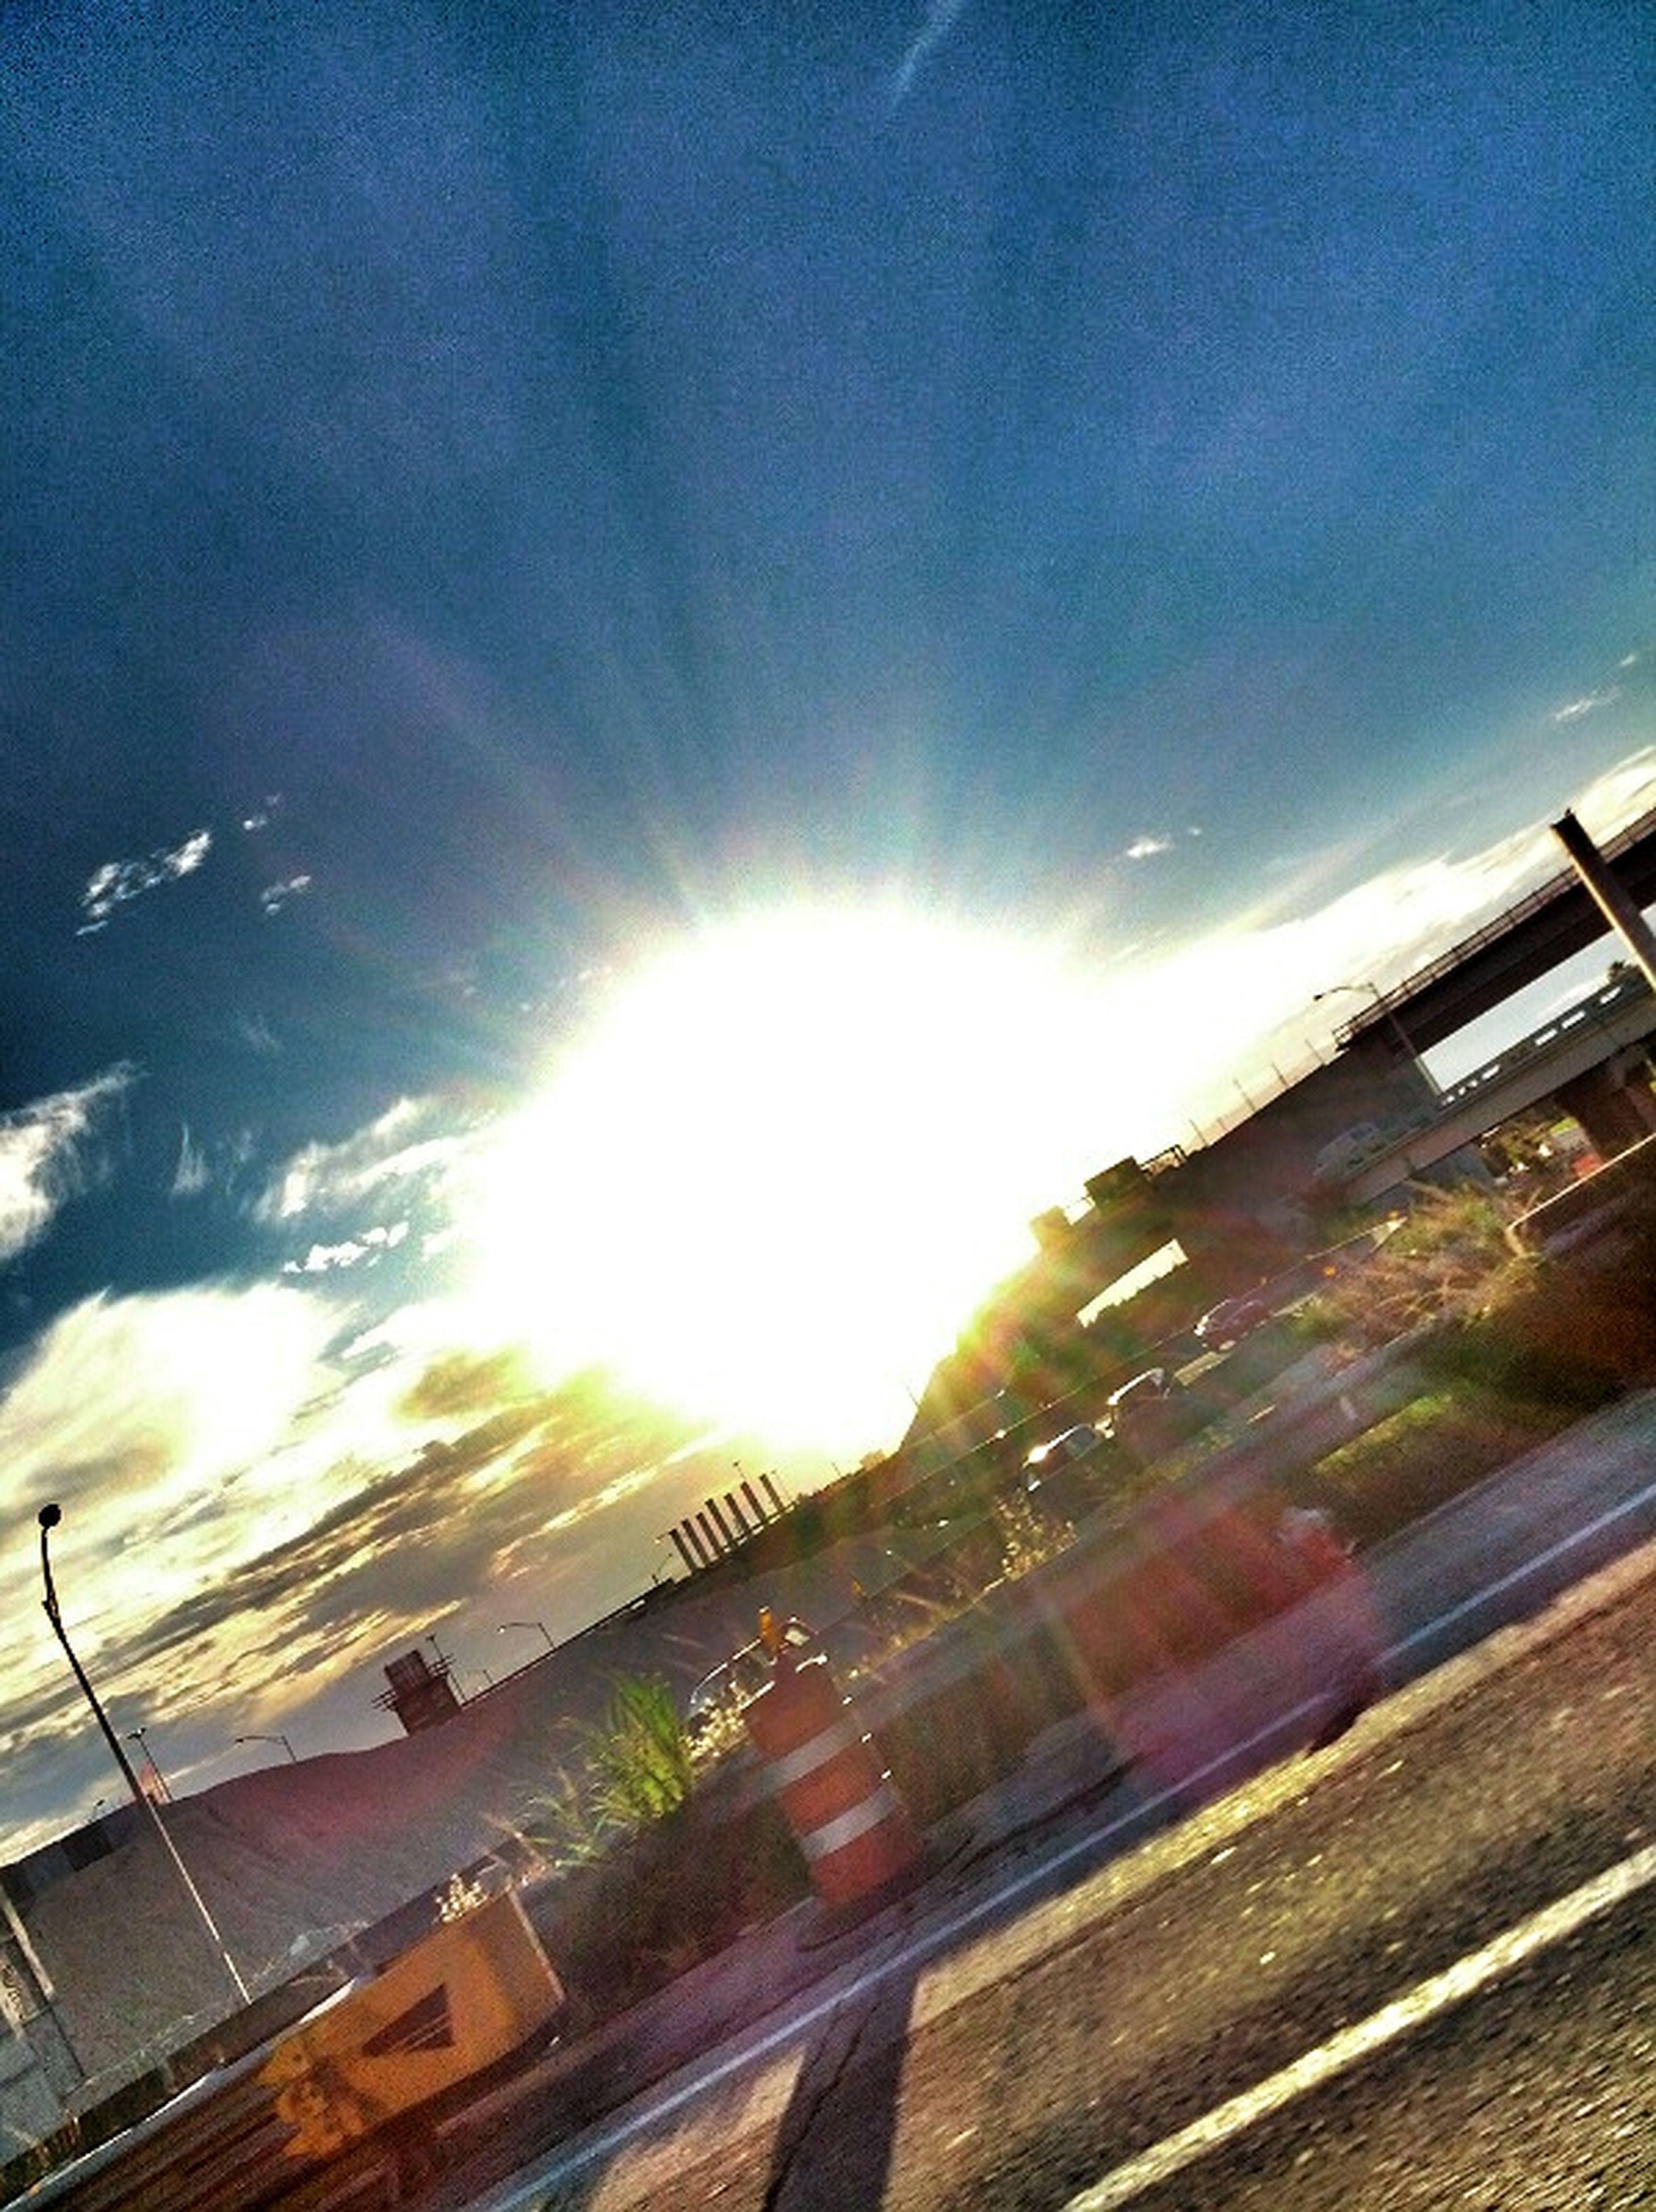 sunbeam, sun, sky, transportation, sunlight, lens flare, cloud - sky, road, built structure, architecture, building exterior, car, land vehicle, city, mode of transport, street, sunny, cloud, day, glass - material